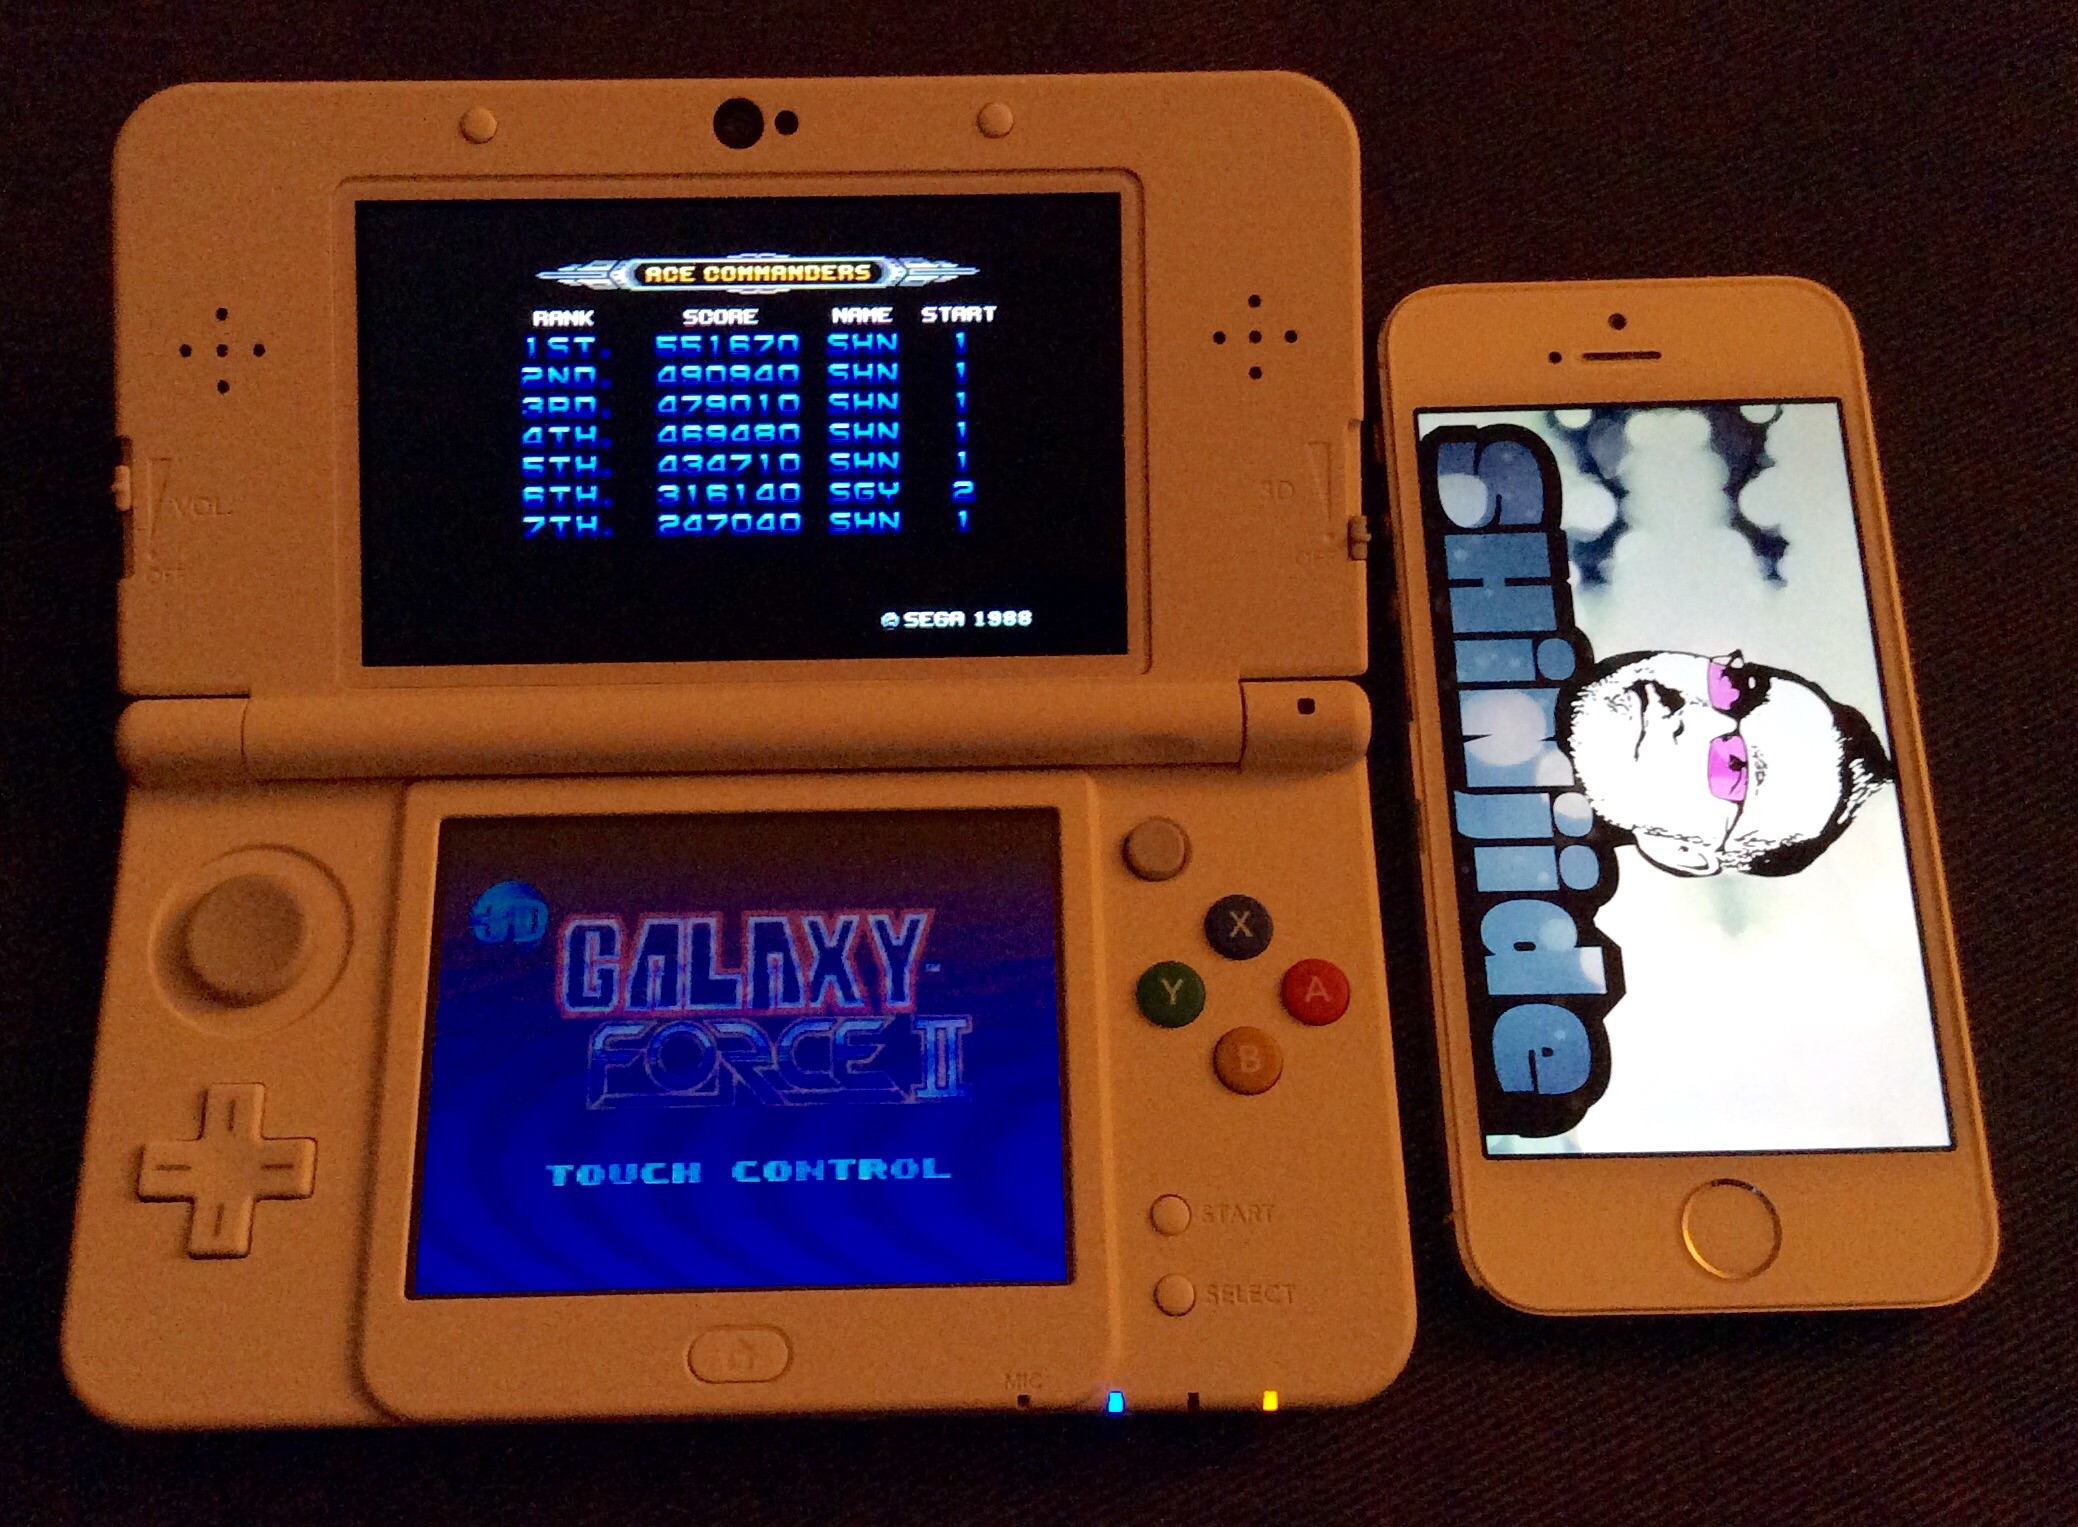 SHiNjide: Galaxy Force II 3D (Nintendo 3DS) 551,670 points on 2015-01-21 15:21:15